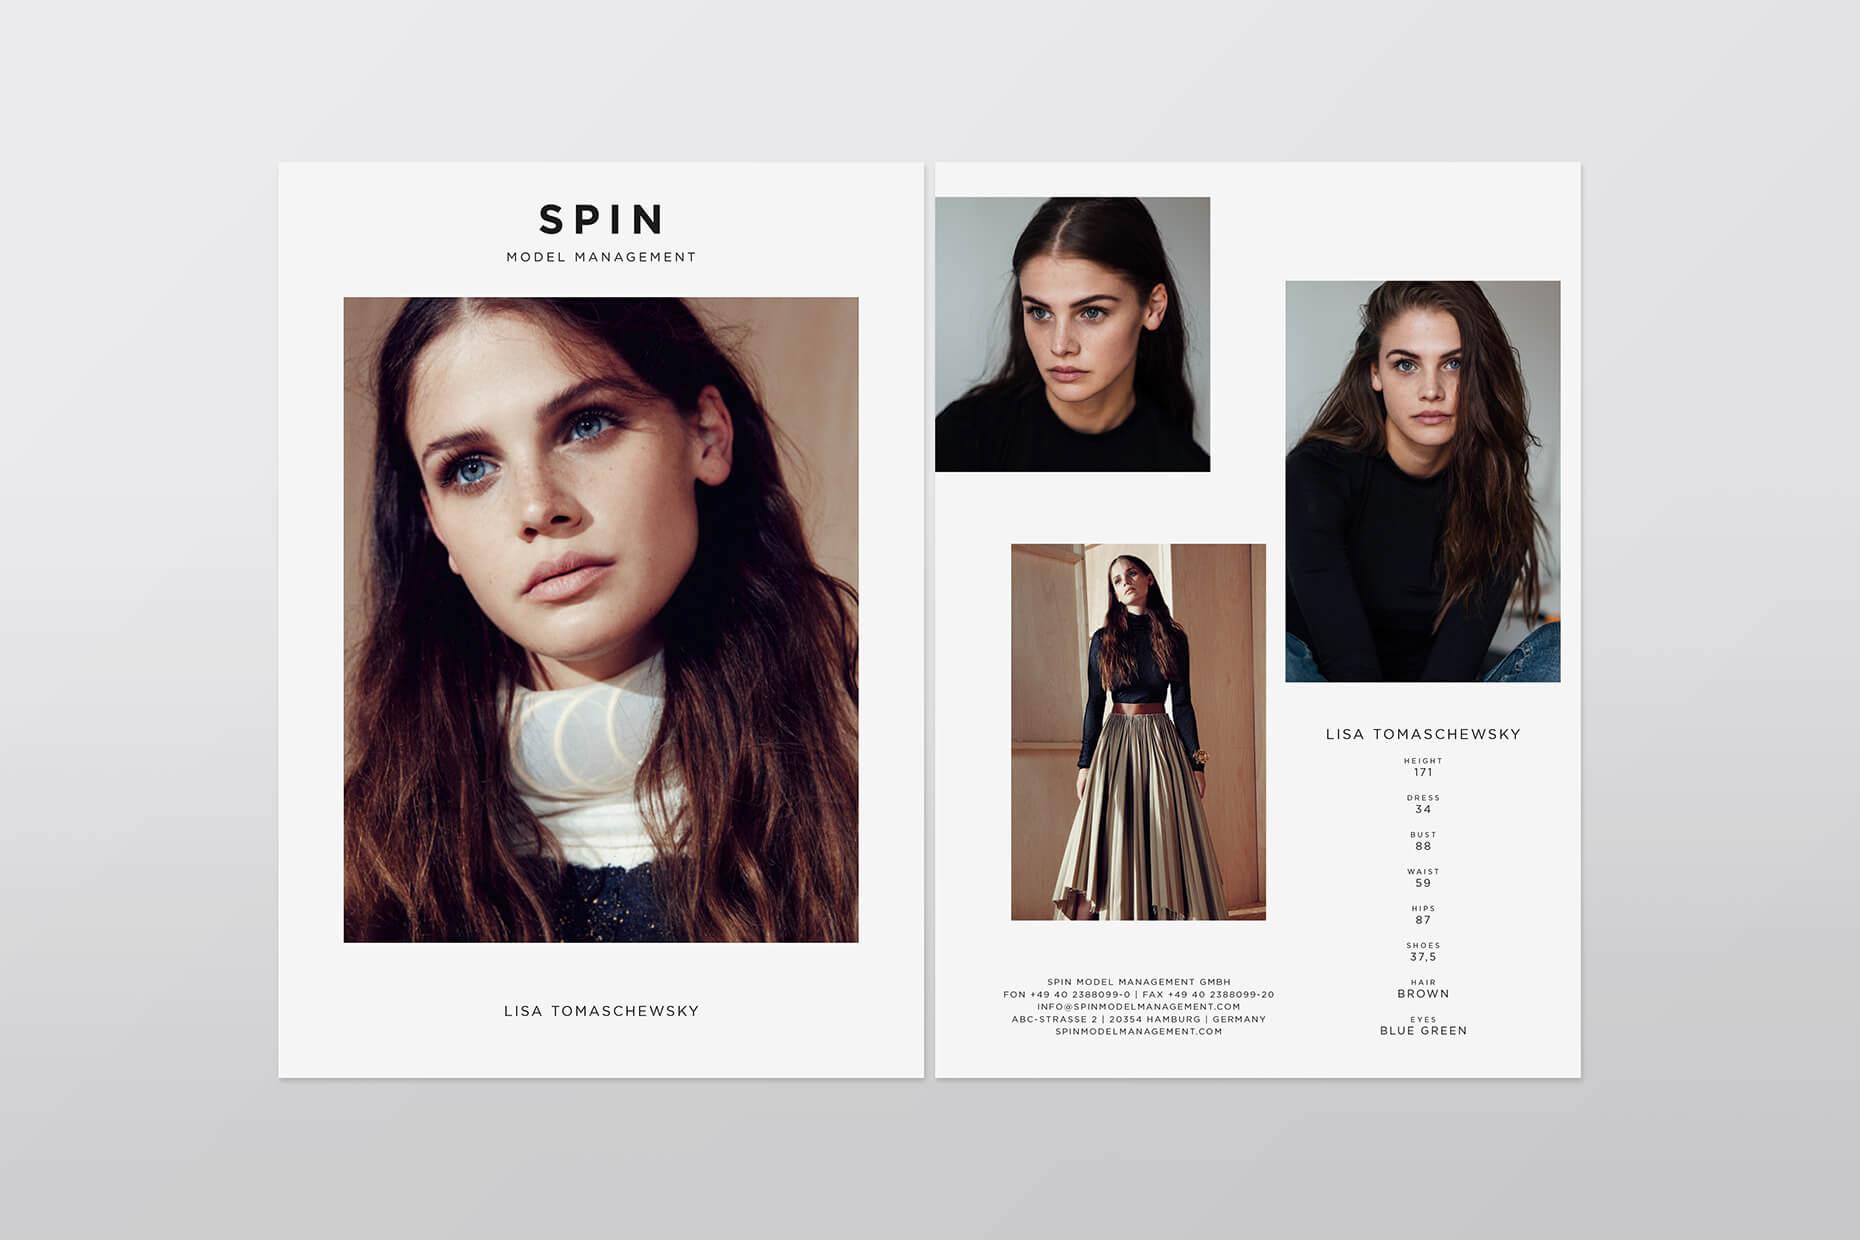 Spin Modelmanagement Design